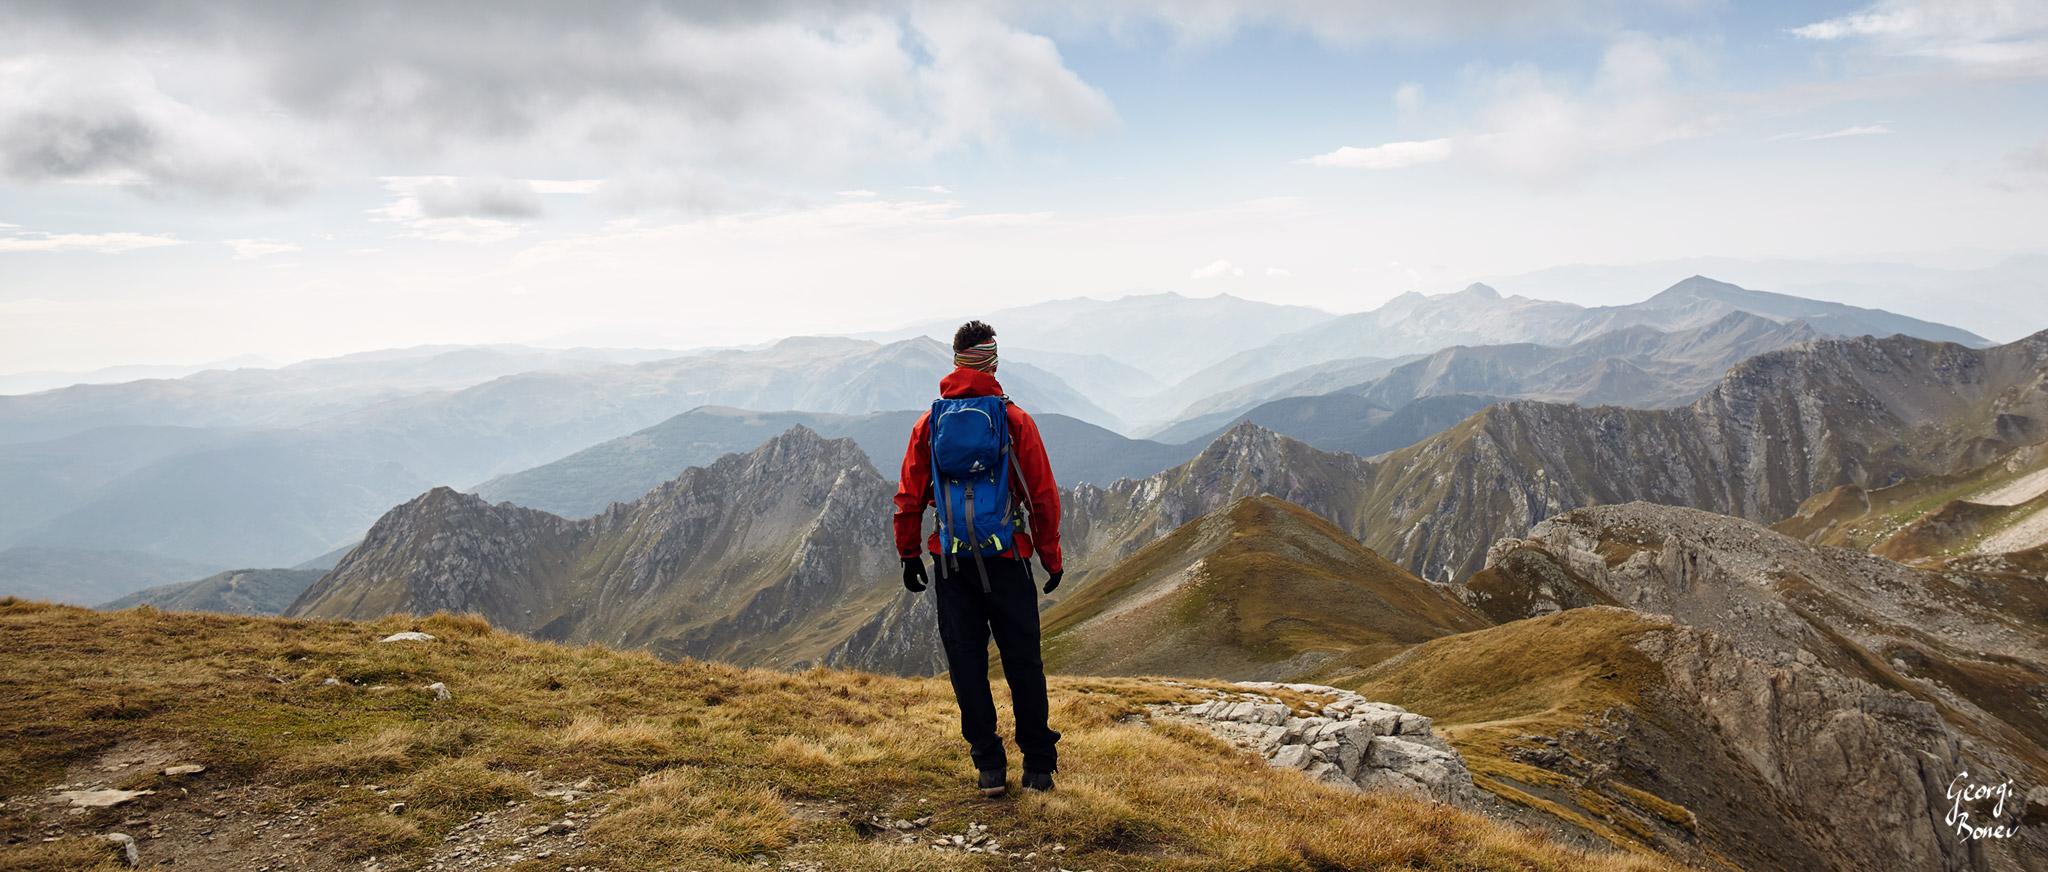 Korab Mountain, Mavrovo National Park, Macedonia & Albania